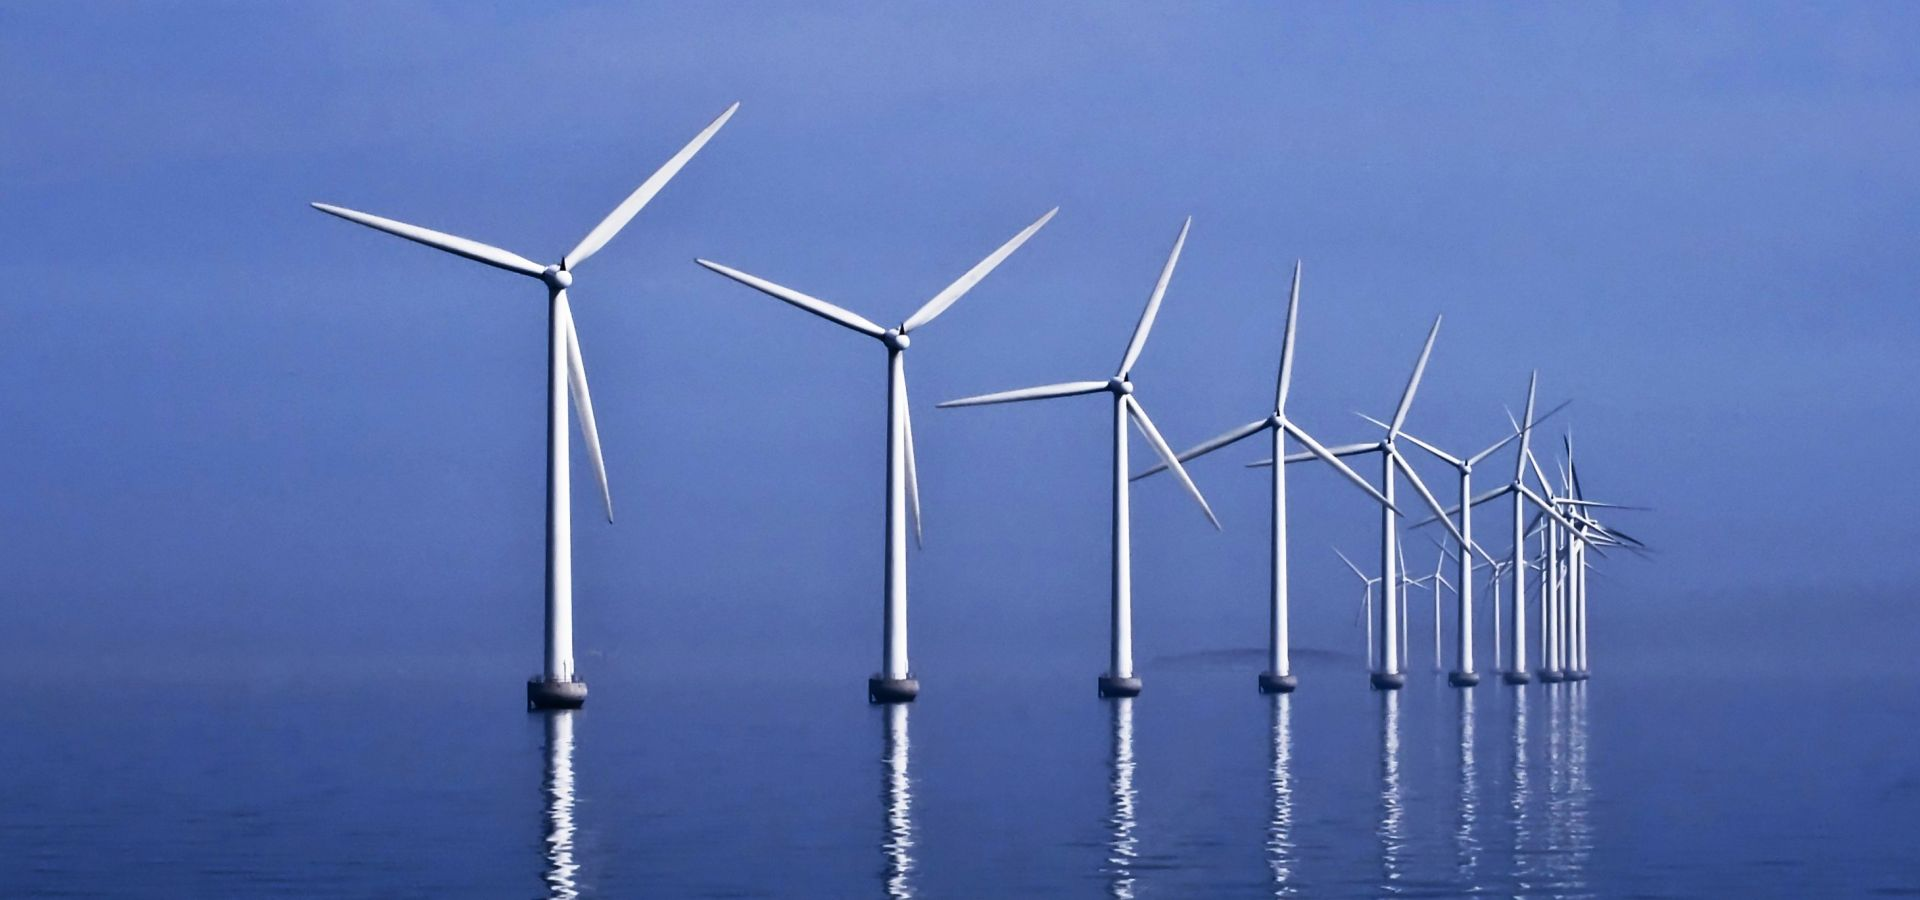 Middelgrunden offshore wind farm (40 MW) observed in Øresund